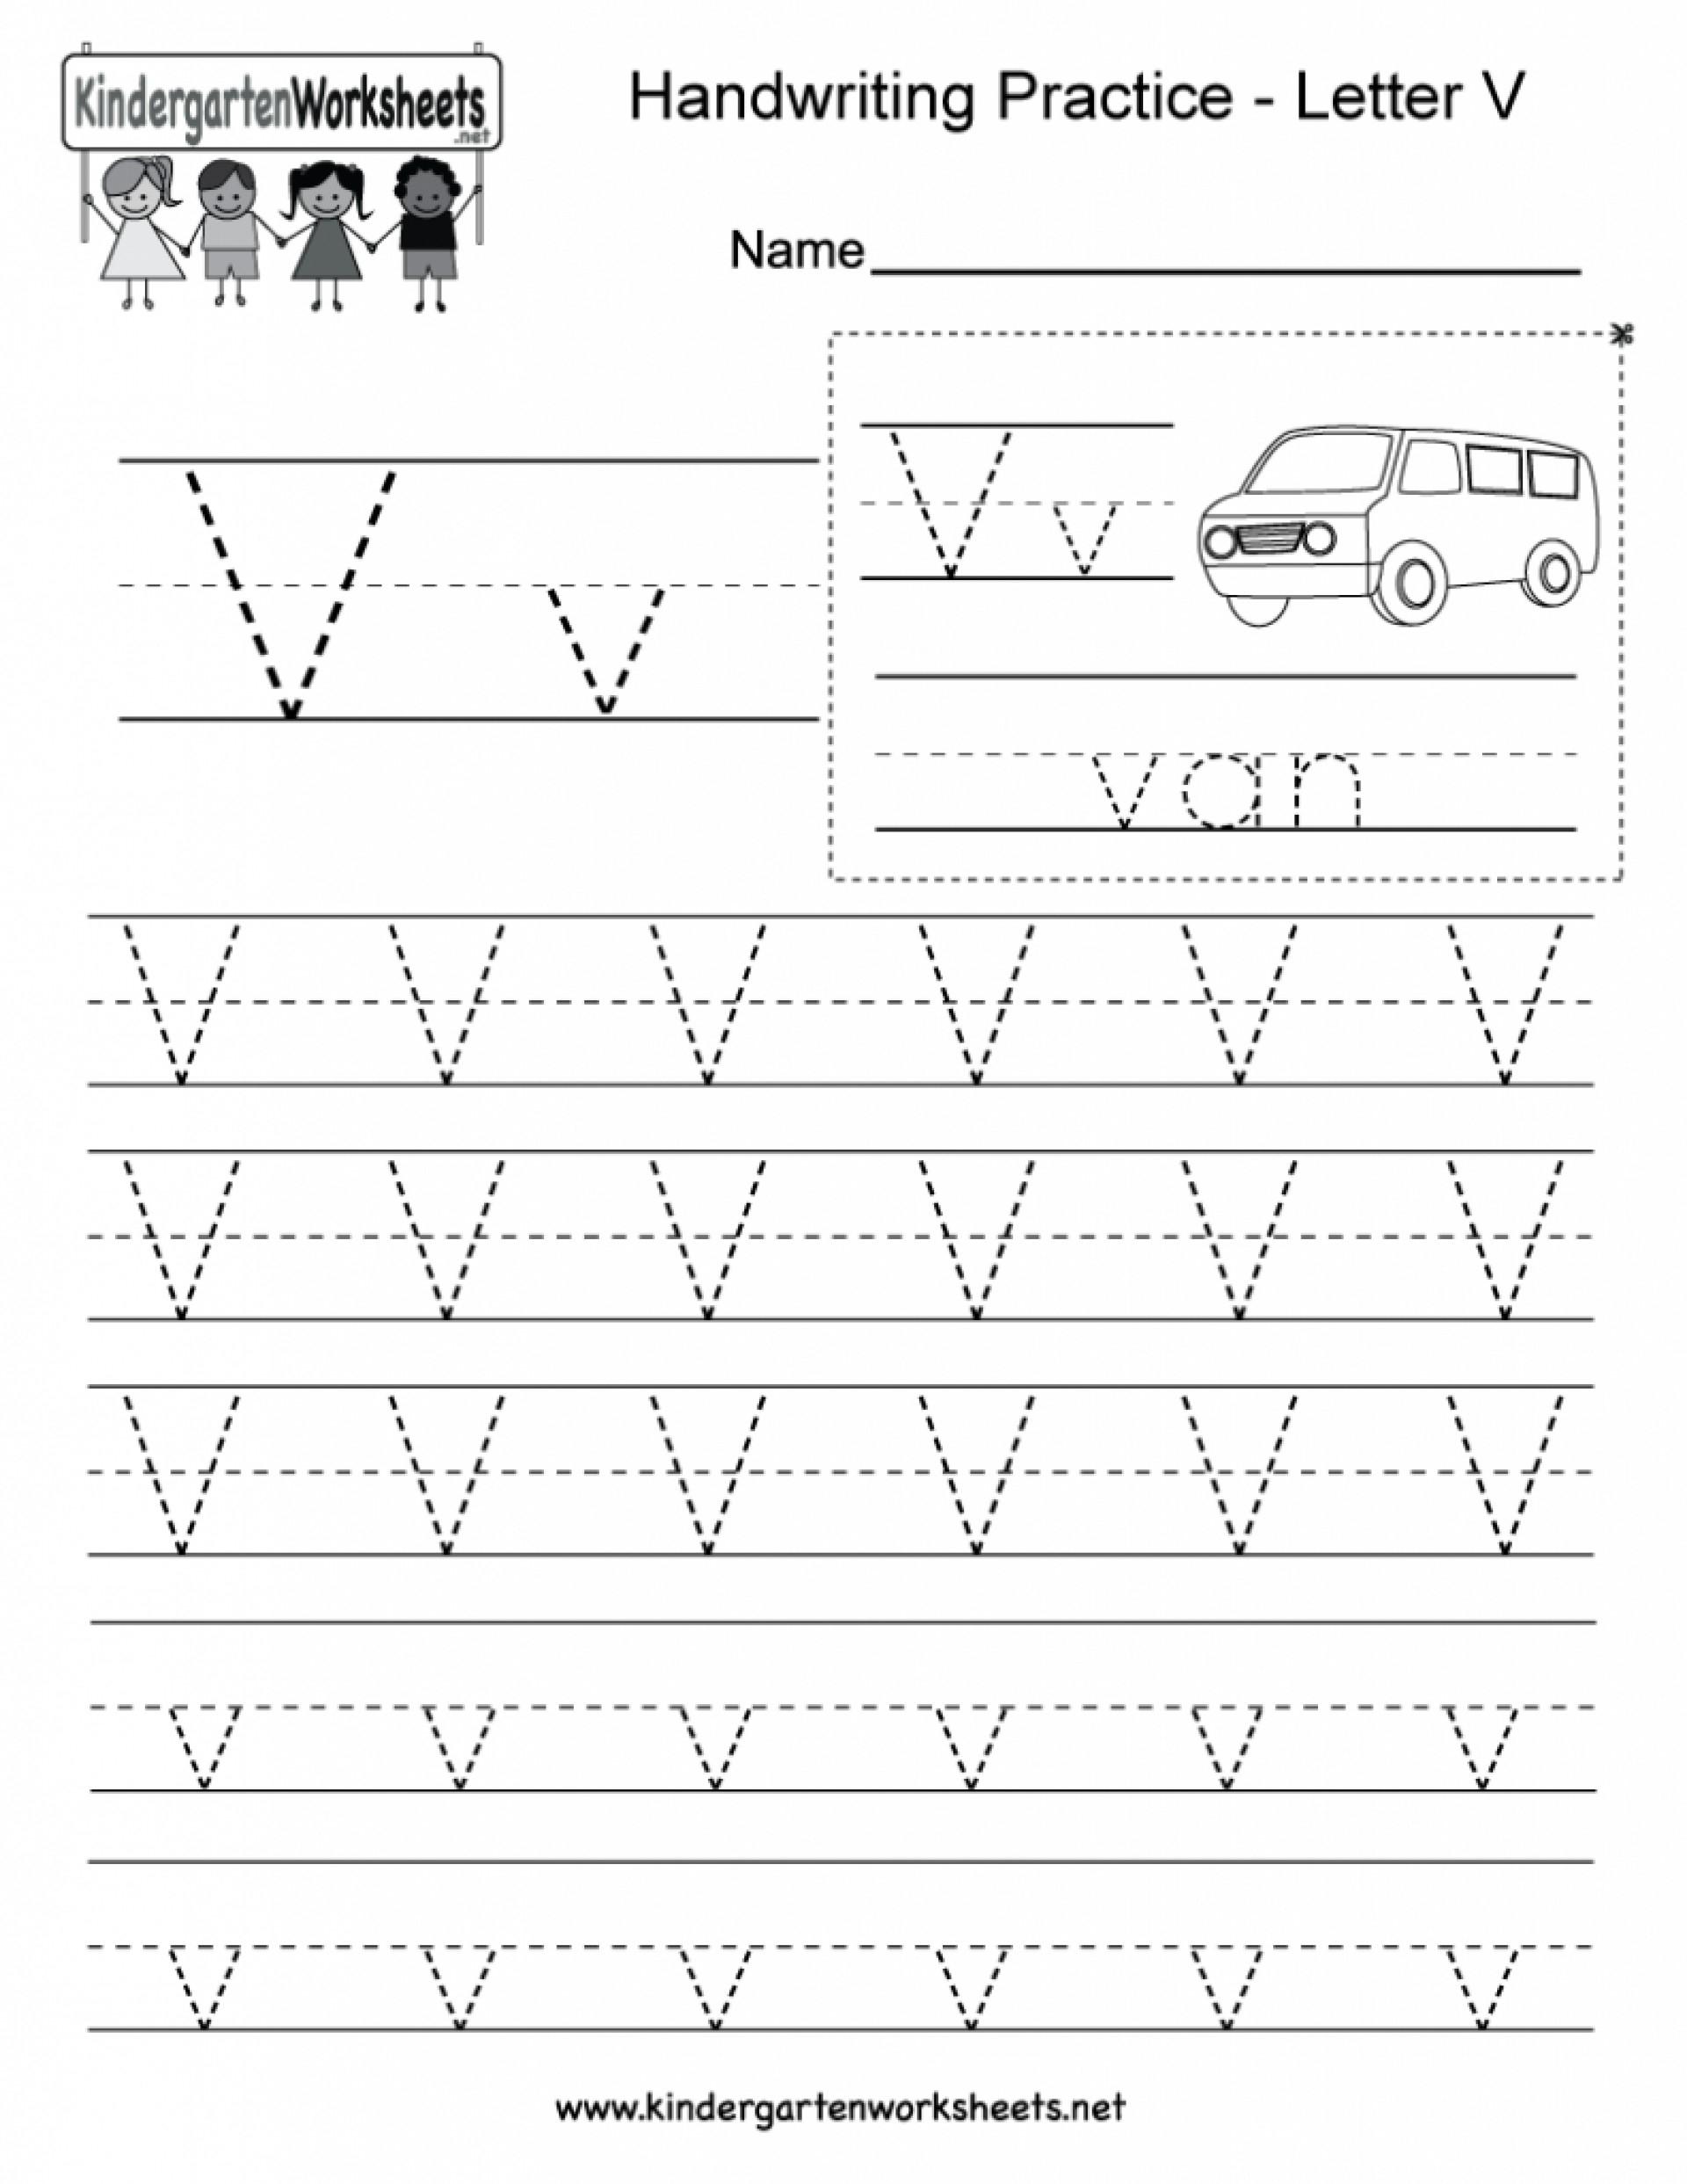 Handwriting Worksheets For Preschool Alphabet - Clover Hatunisi with regard to Pre-K Alphabet Handwriting Worksheets